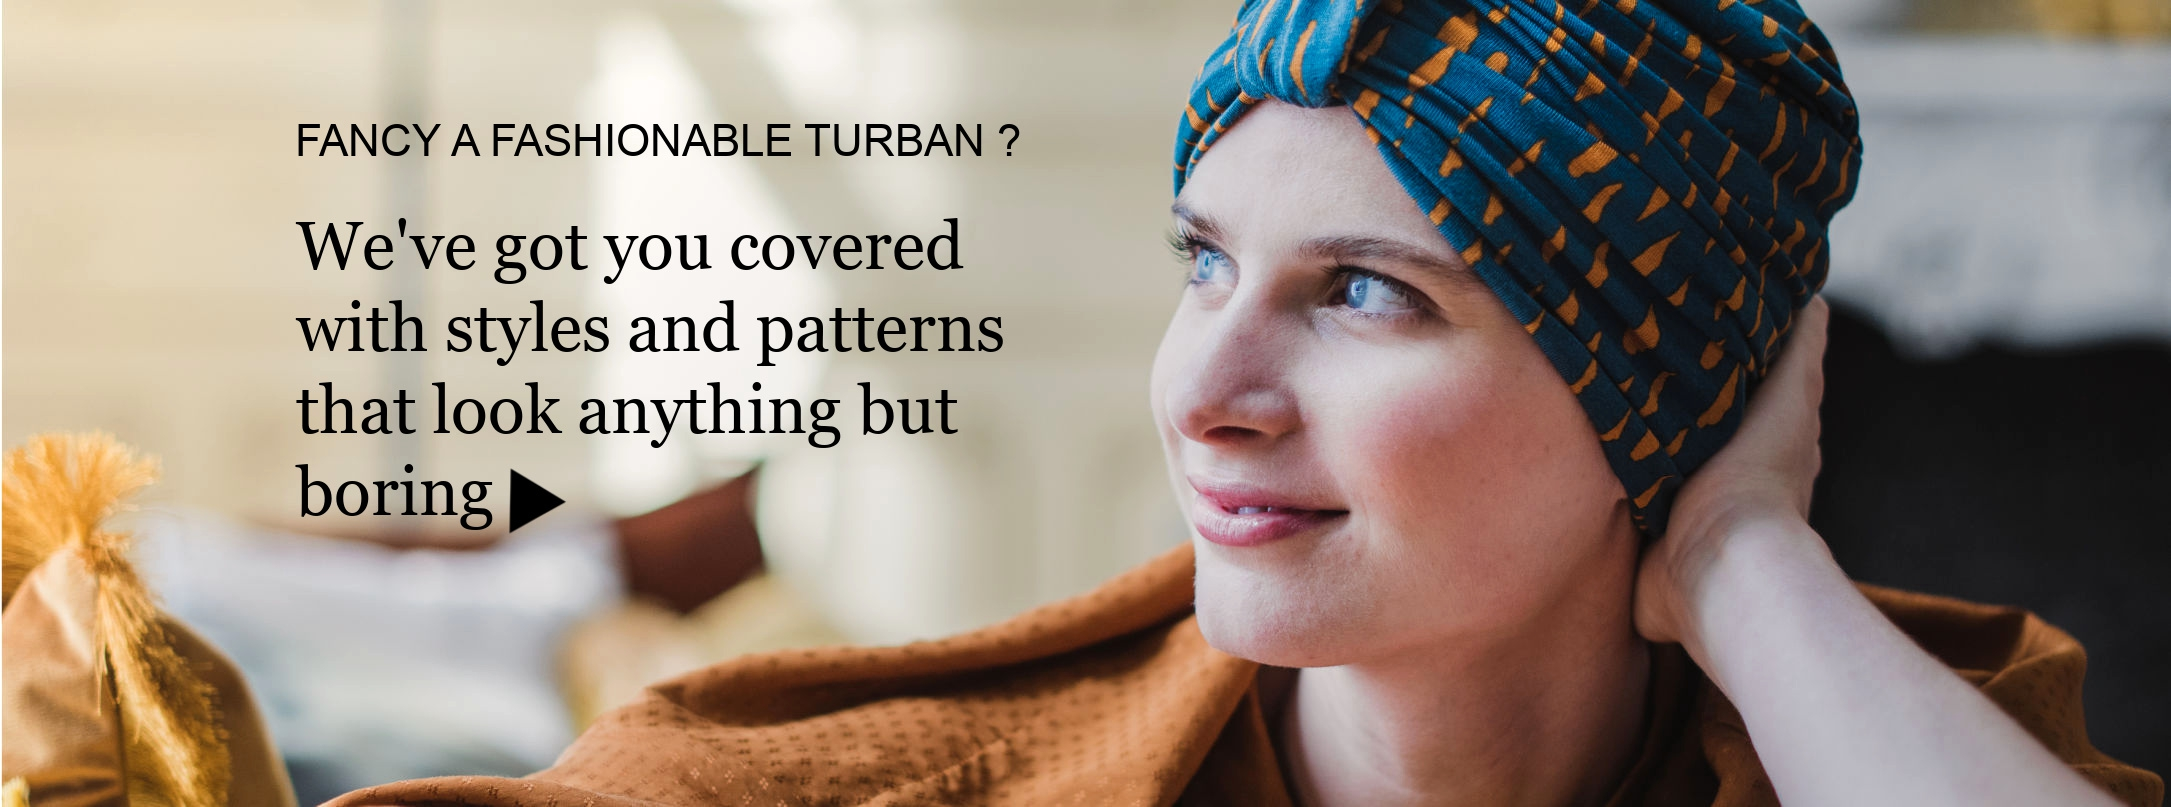 alopecia turbans for chemo patients